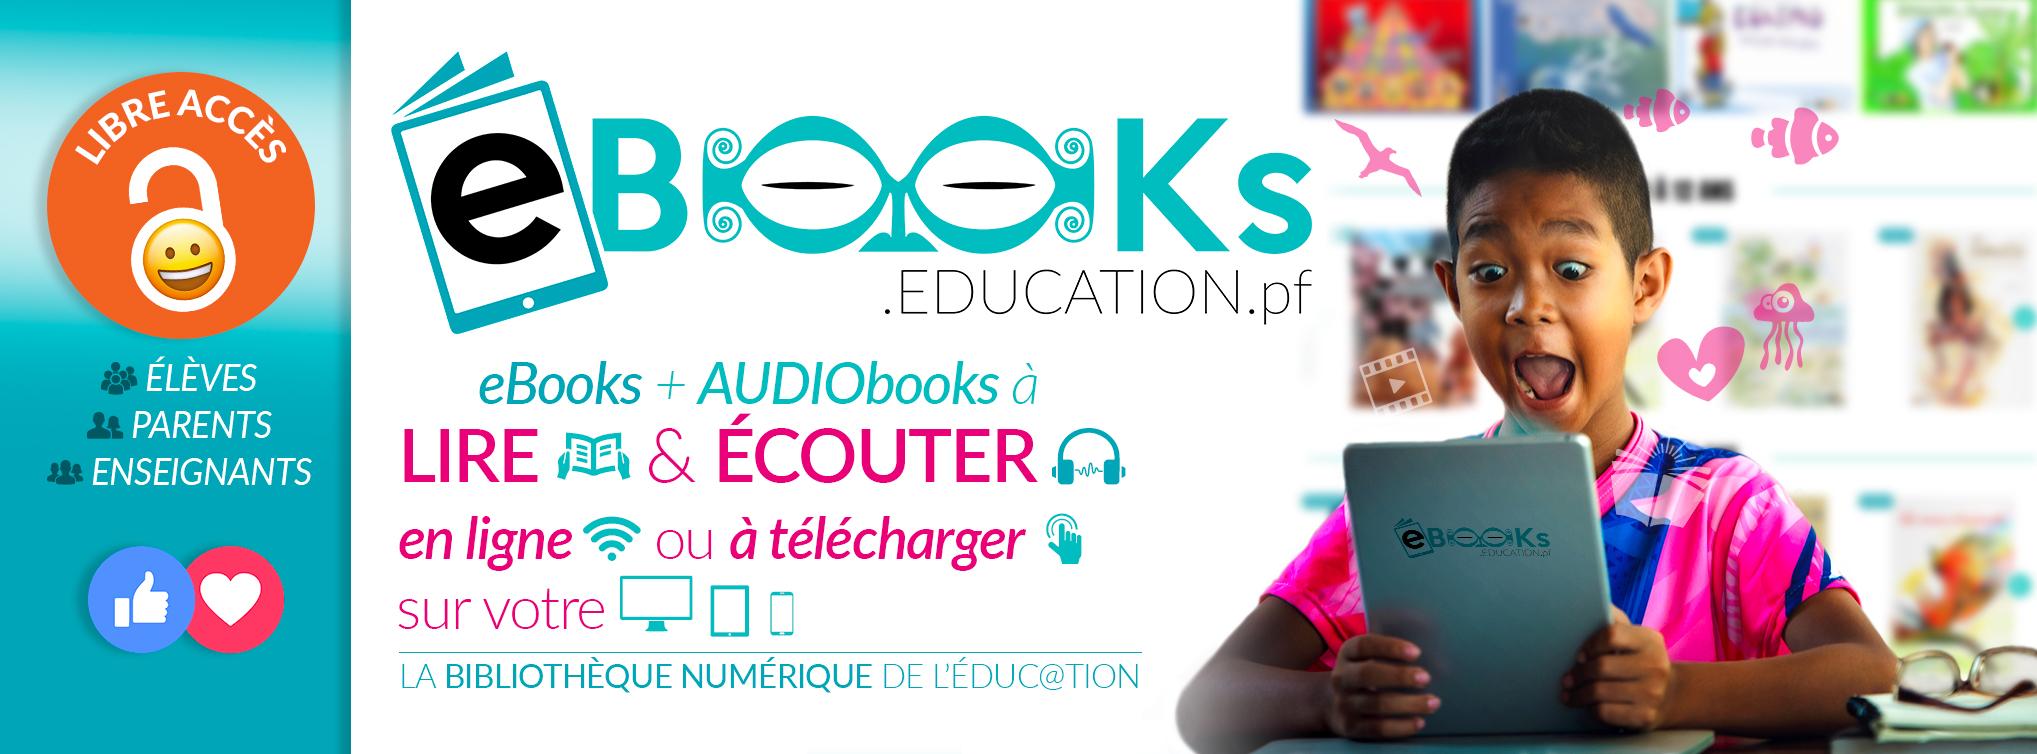 cover2-ebookseducation